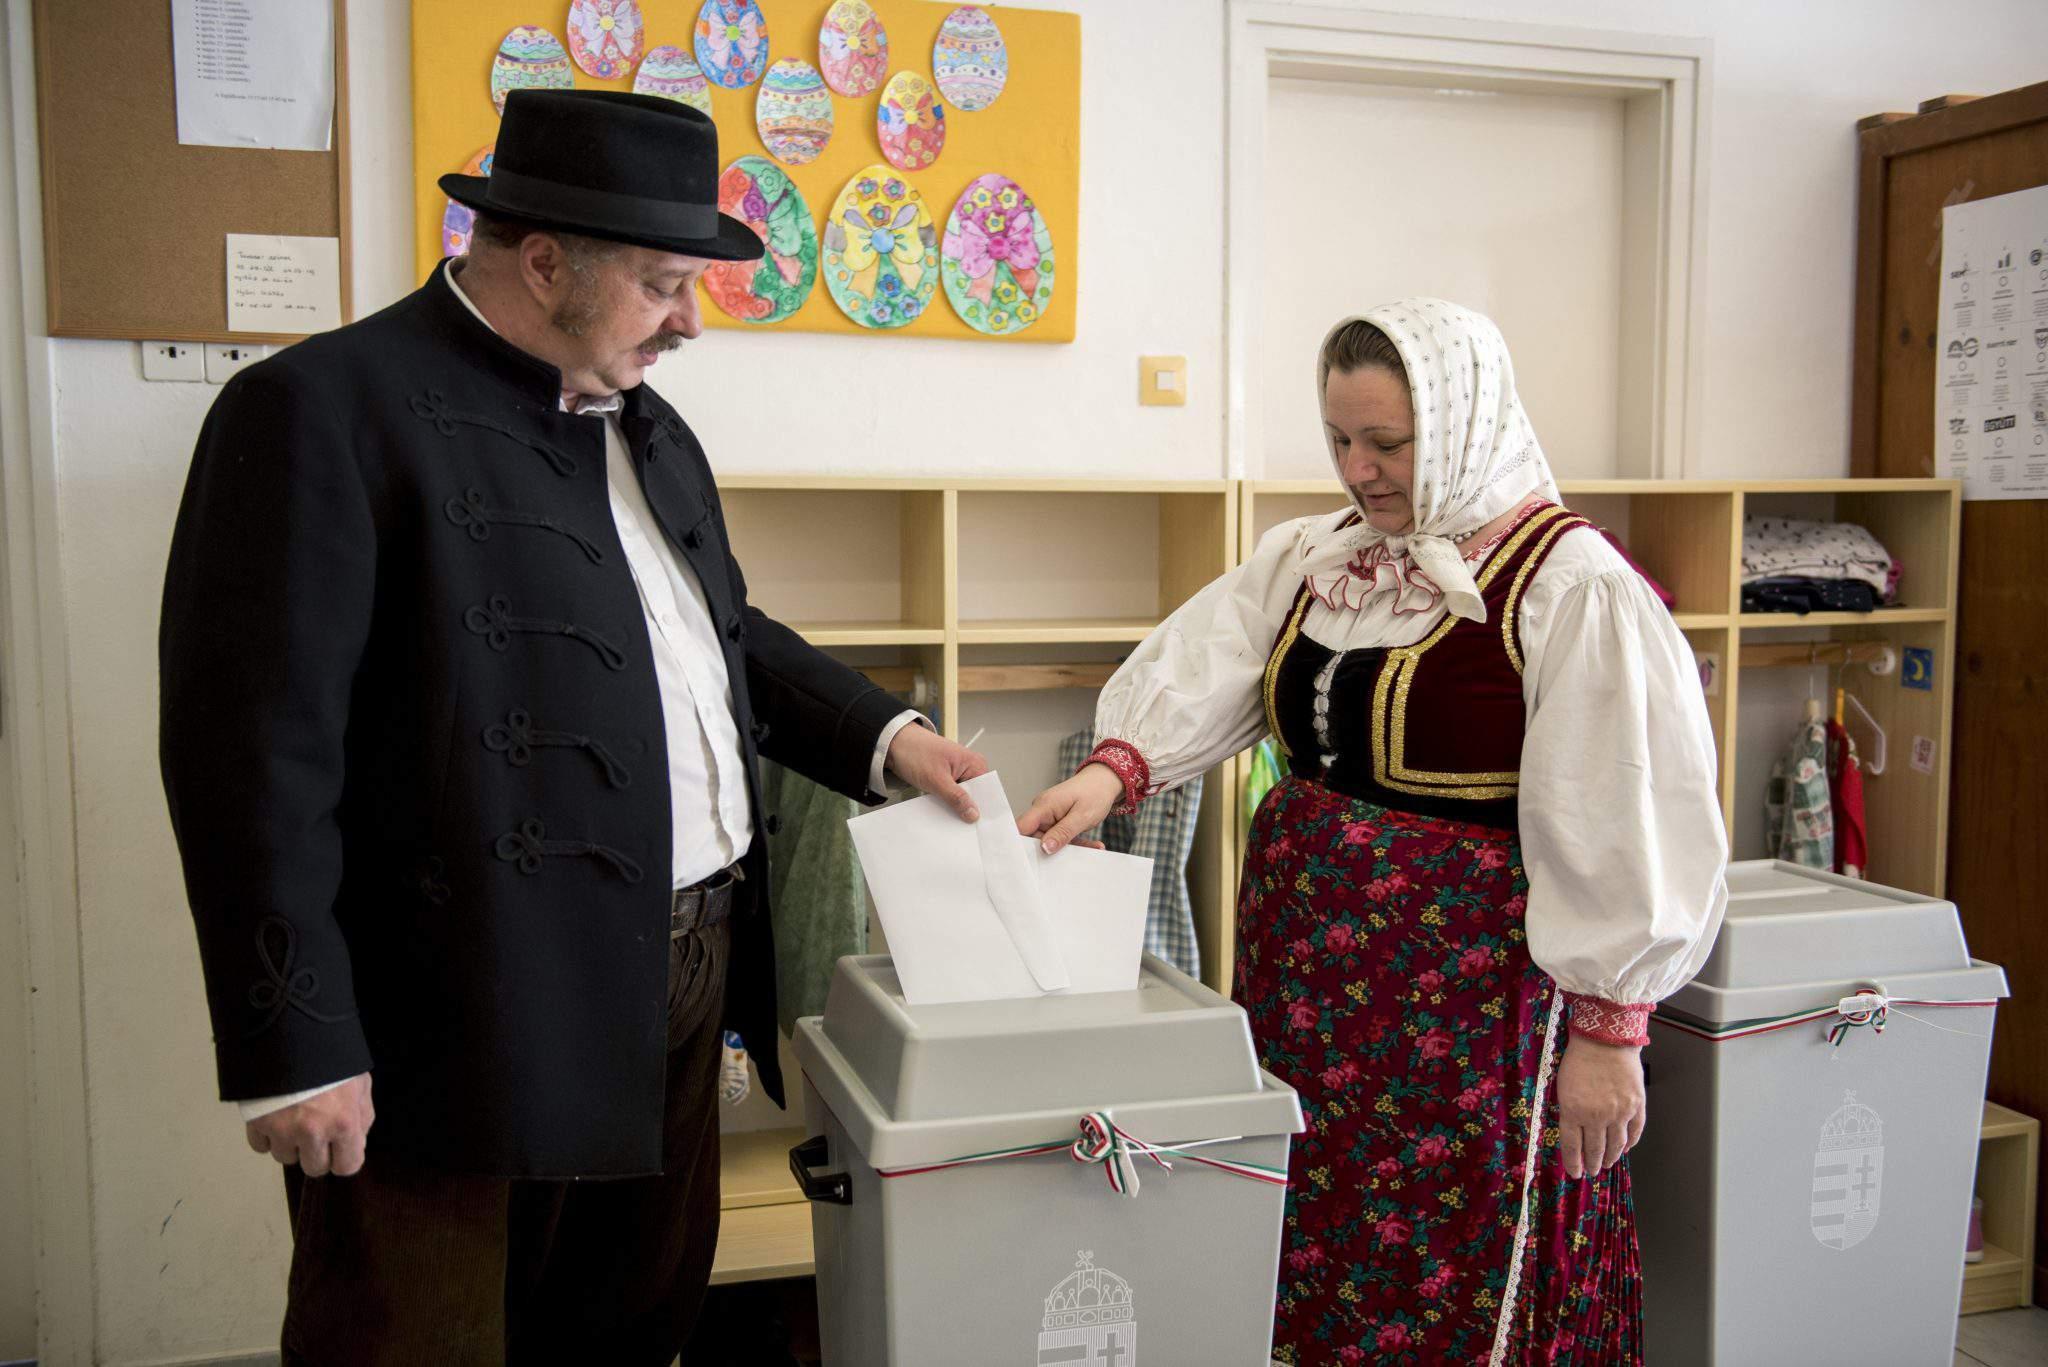 Hungary election 2018